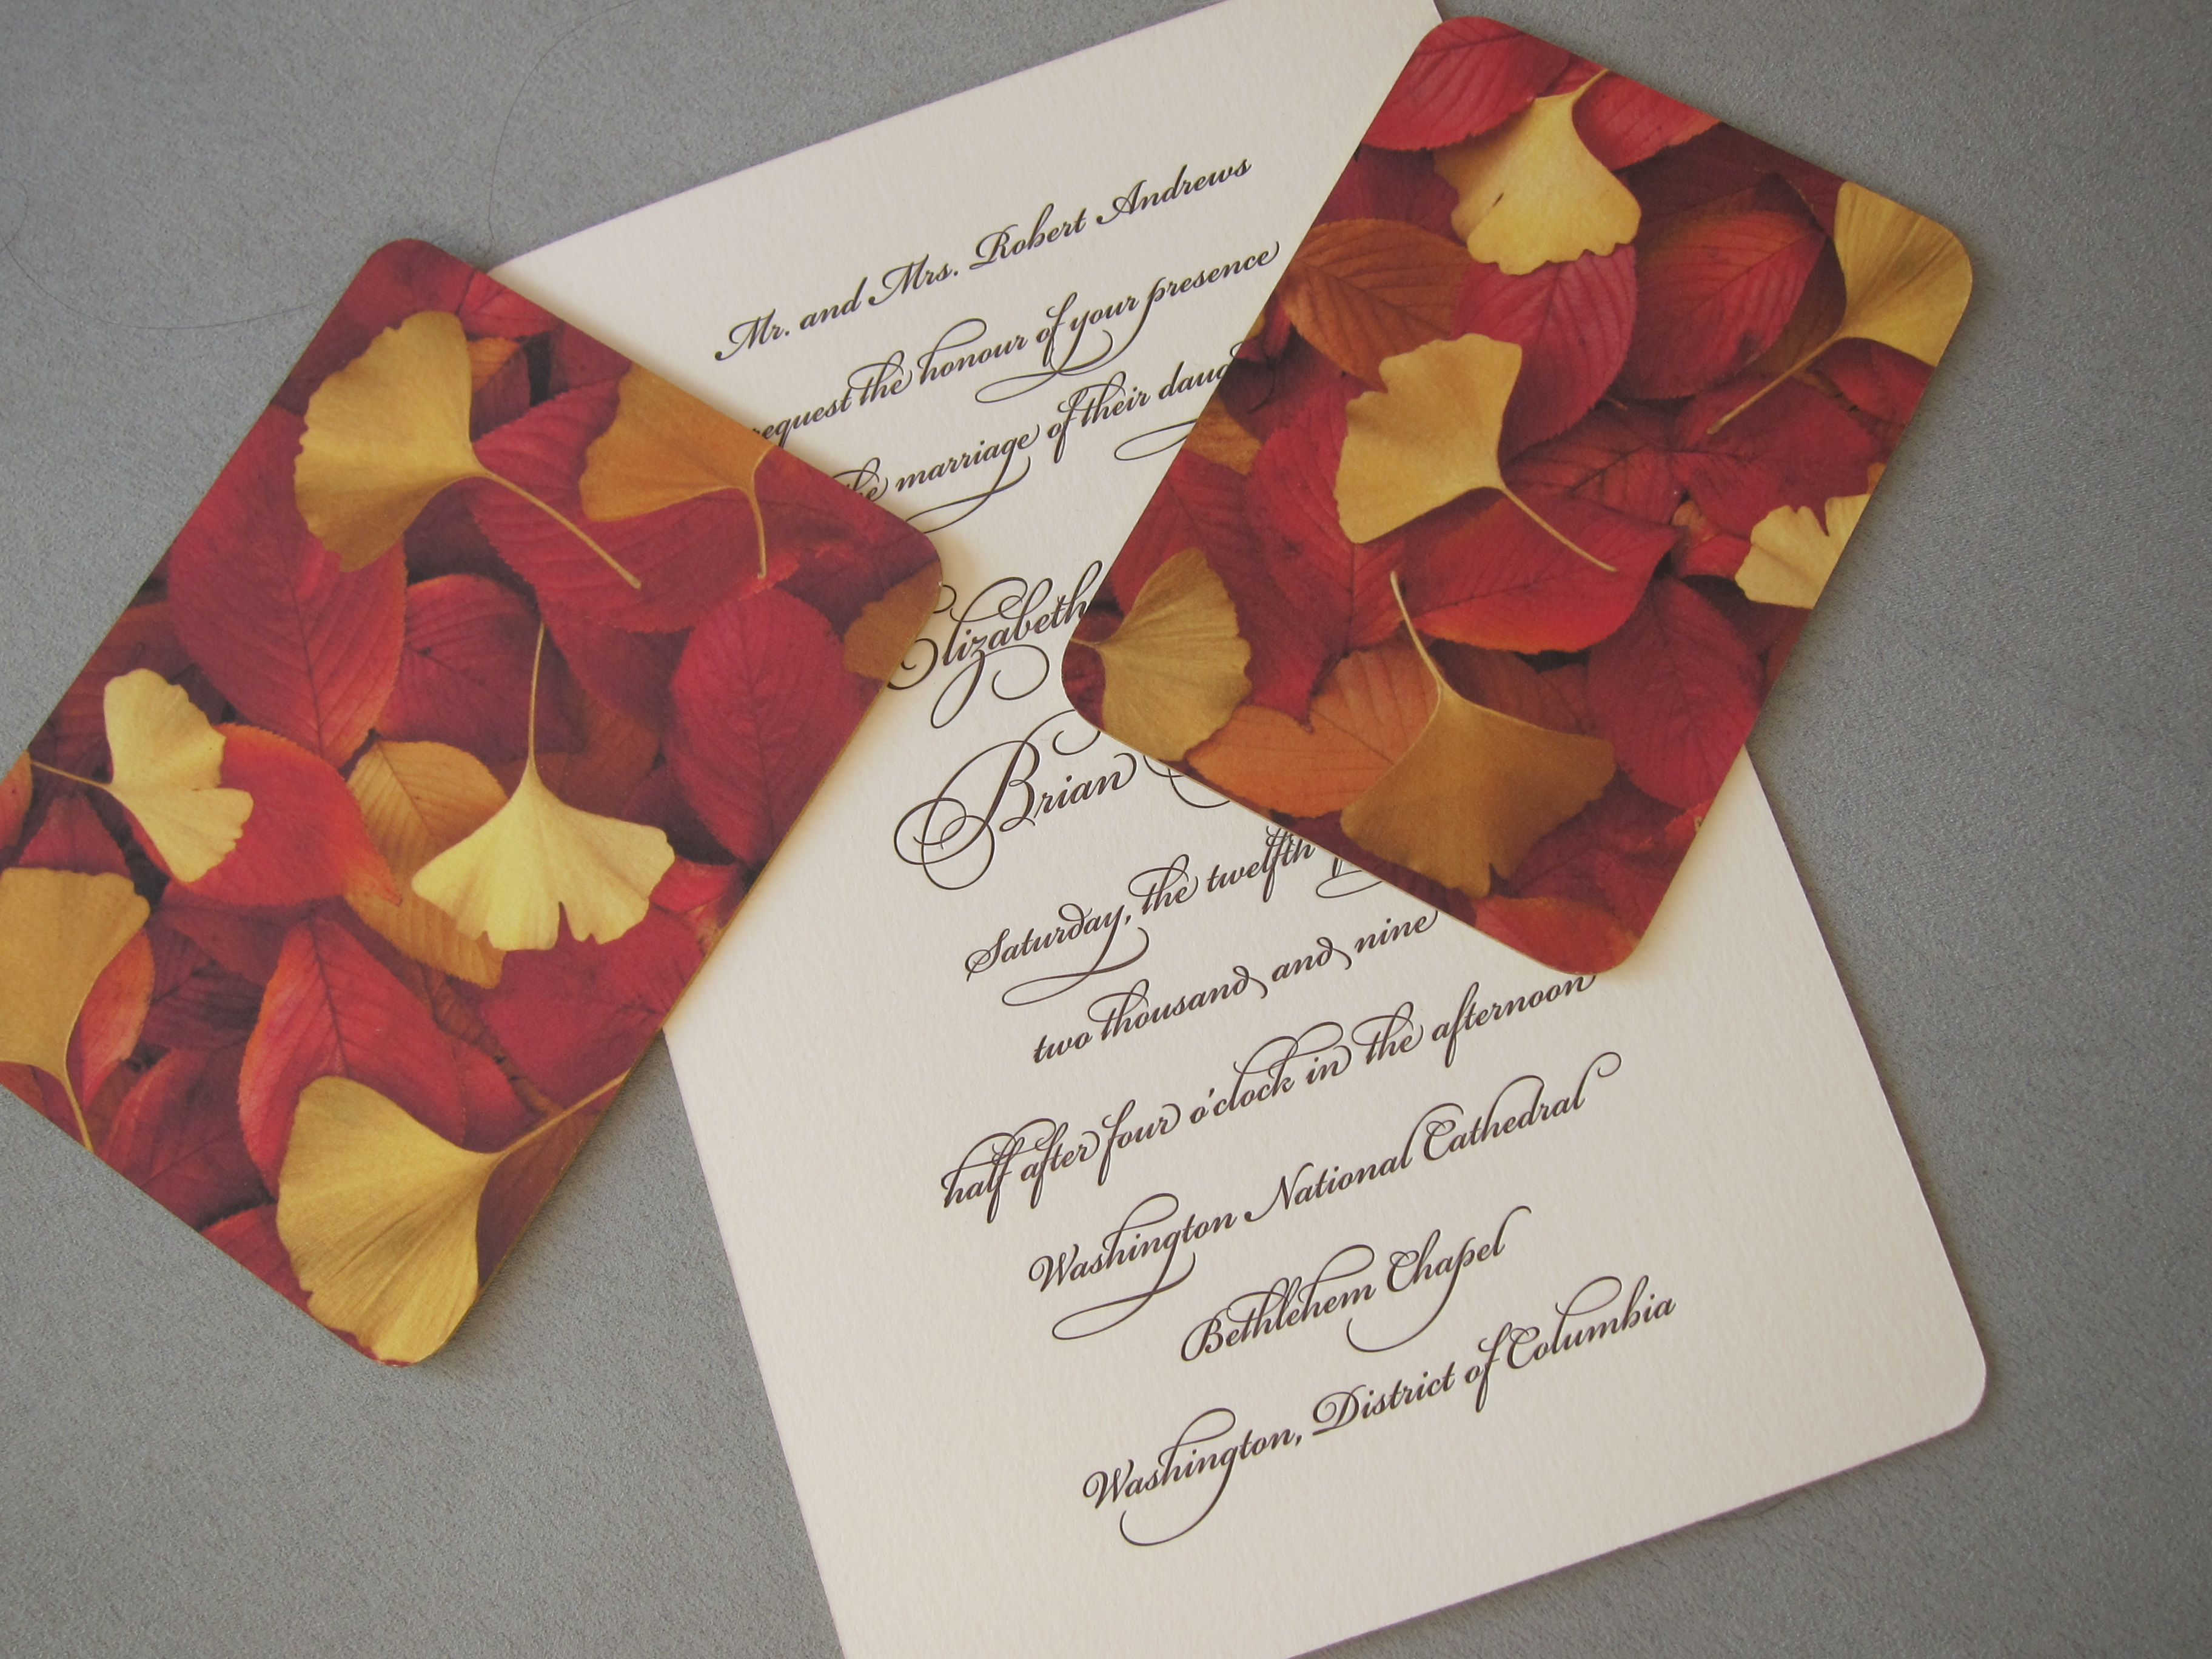 Julie Holcomb Letterpress Wedding Invitations   VERMONT WEDDING PARLOR